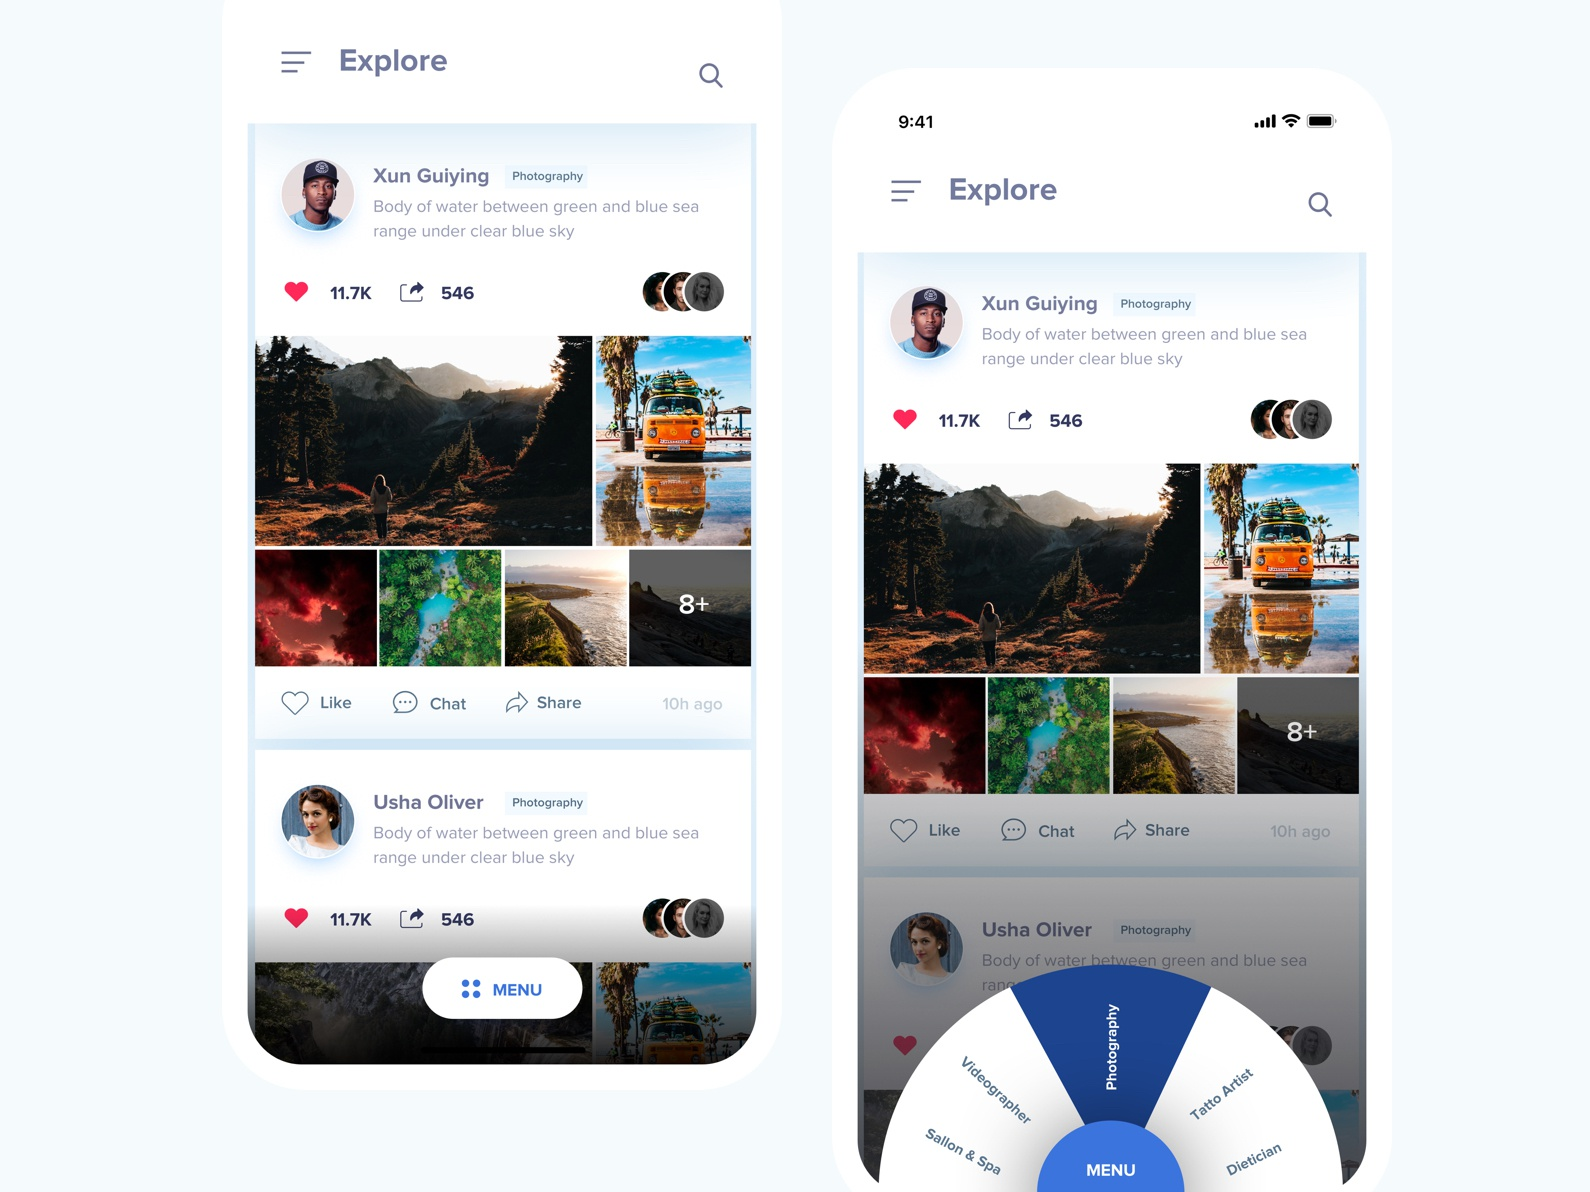 Explore UI latest ui iphone x activity screen typography appdesign uitrends app userinterface design ux concept design ui menu screen menu activity feeds explore